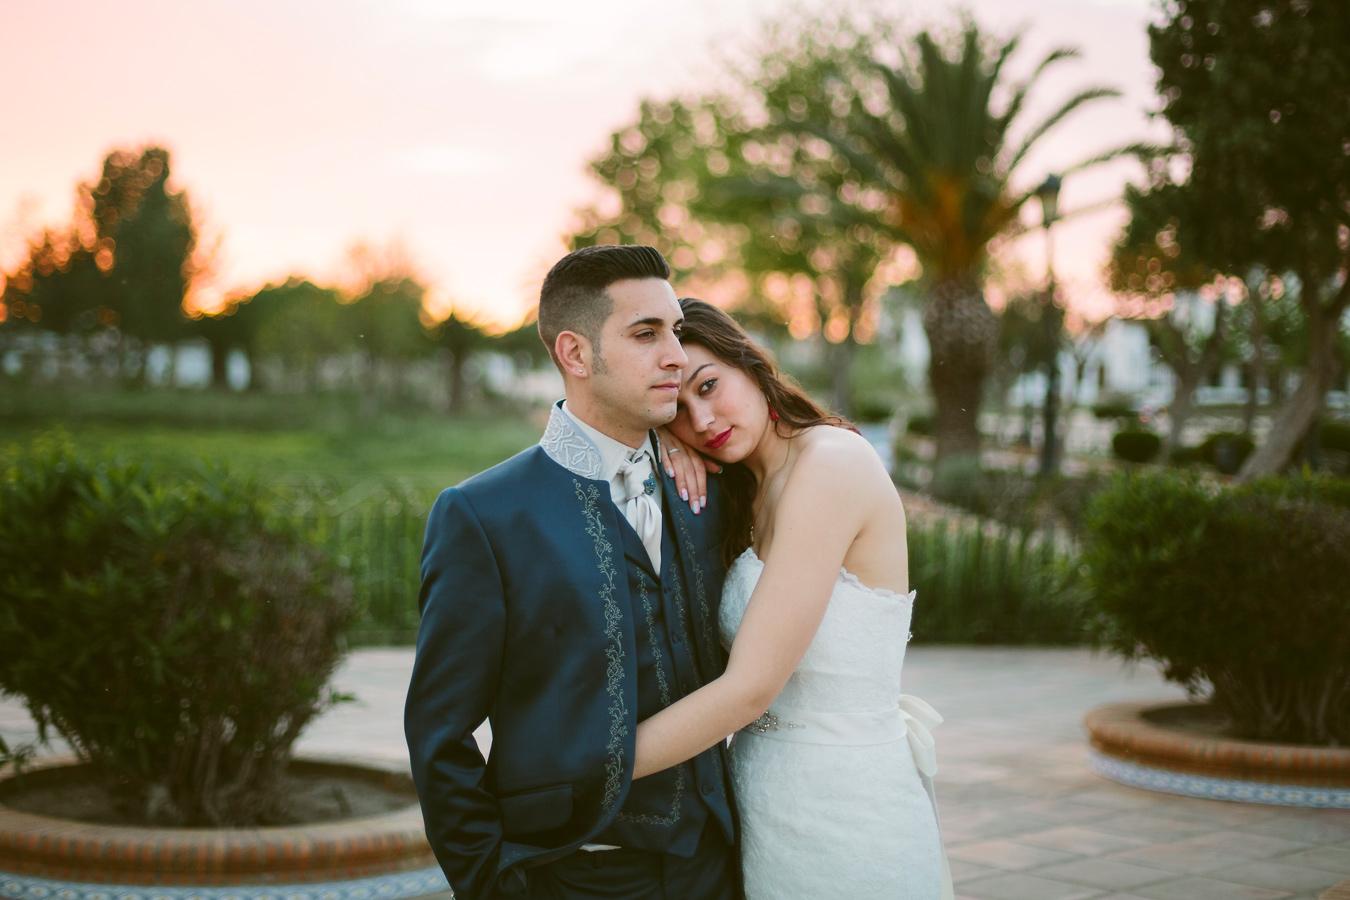 fotografo de boda elrocio archidona malaga postboda granada traje de novio